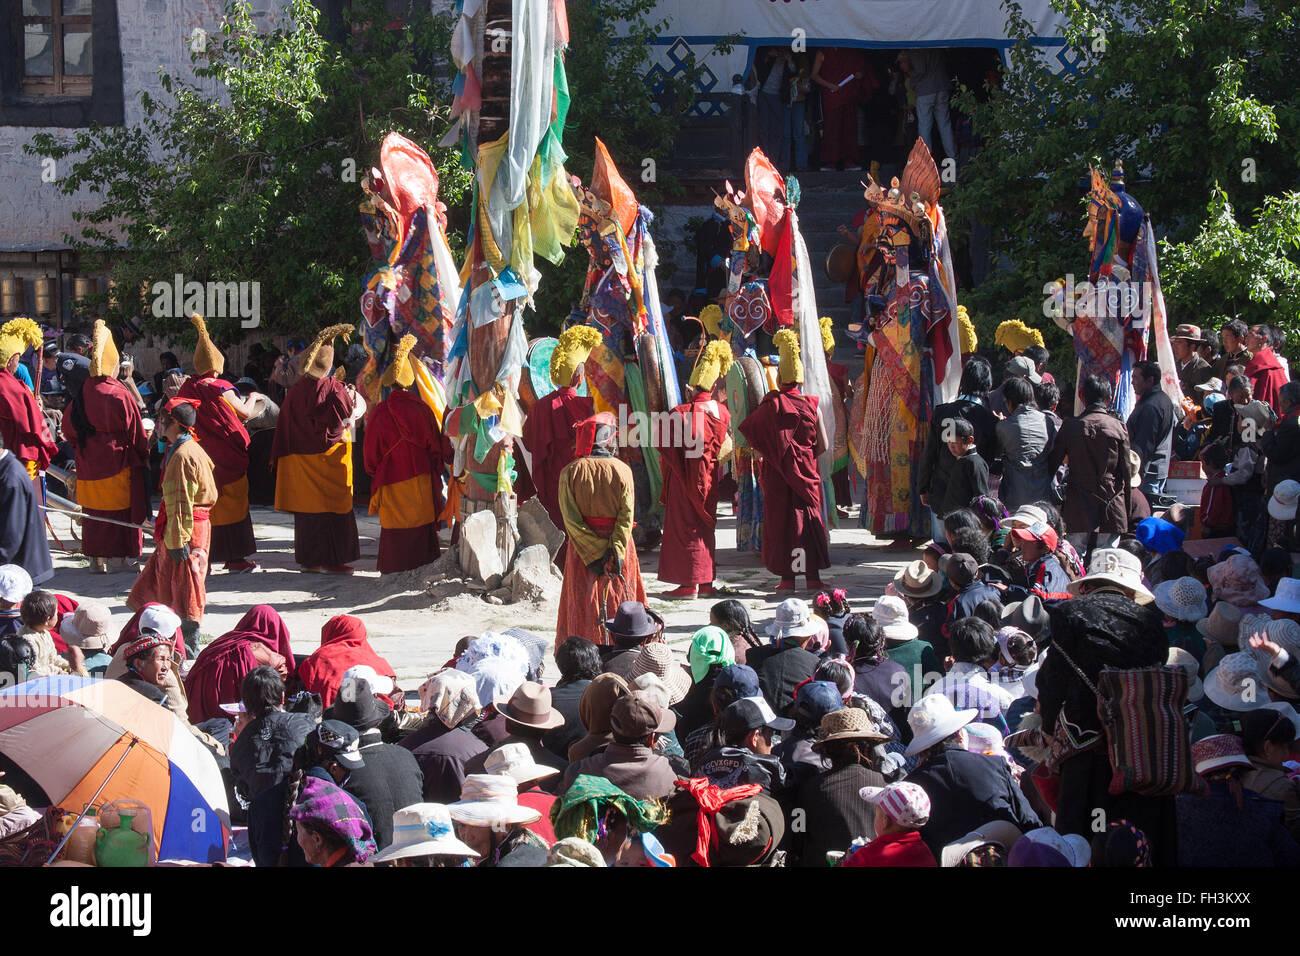 Ritual dance performed by Buddhist Lamas during the Saga Dawa ceremony - Stock Image